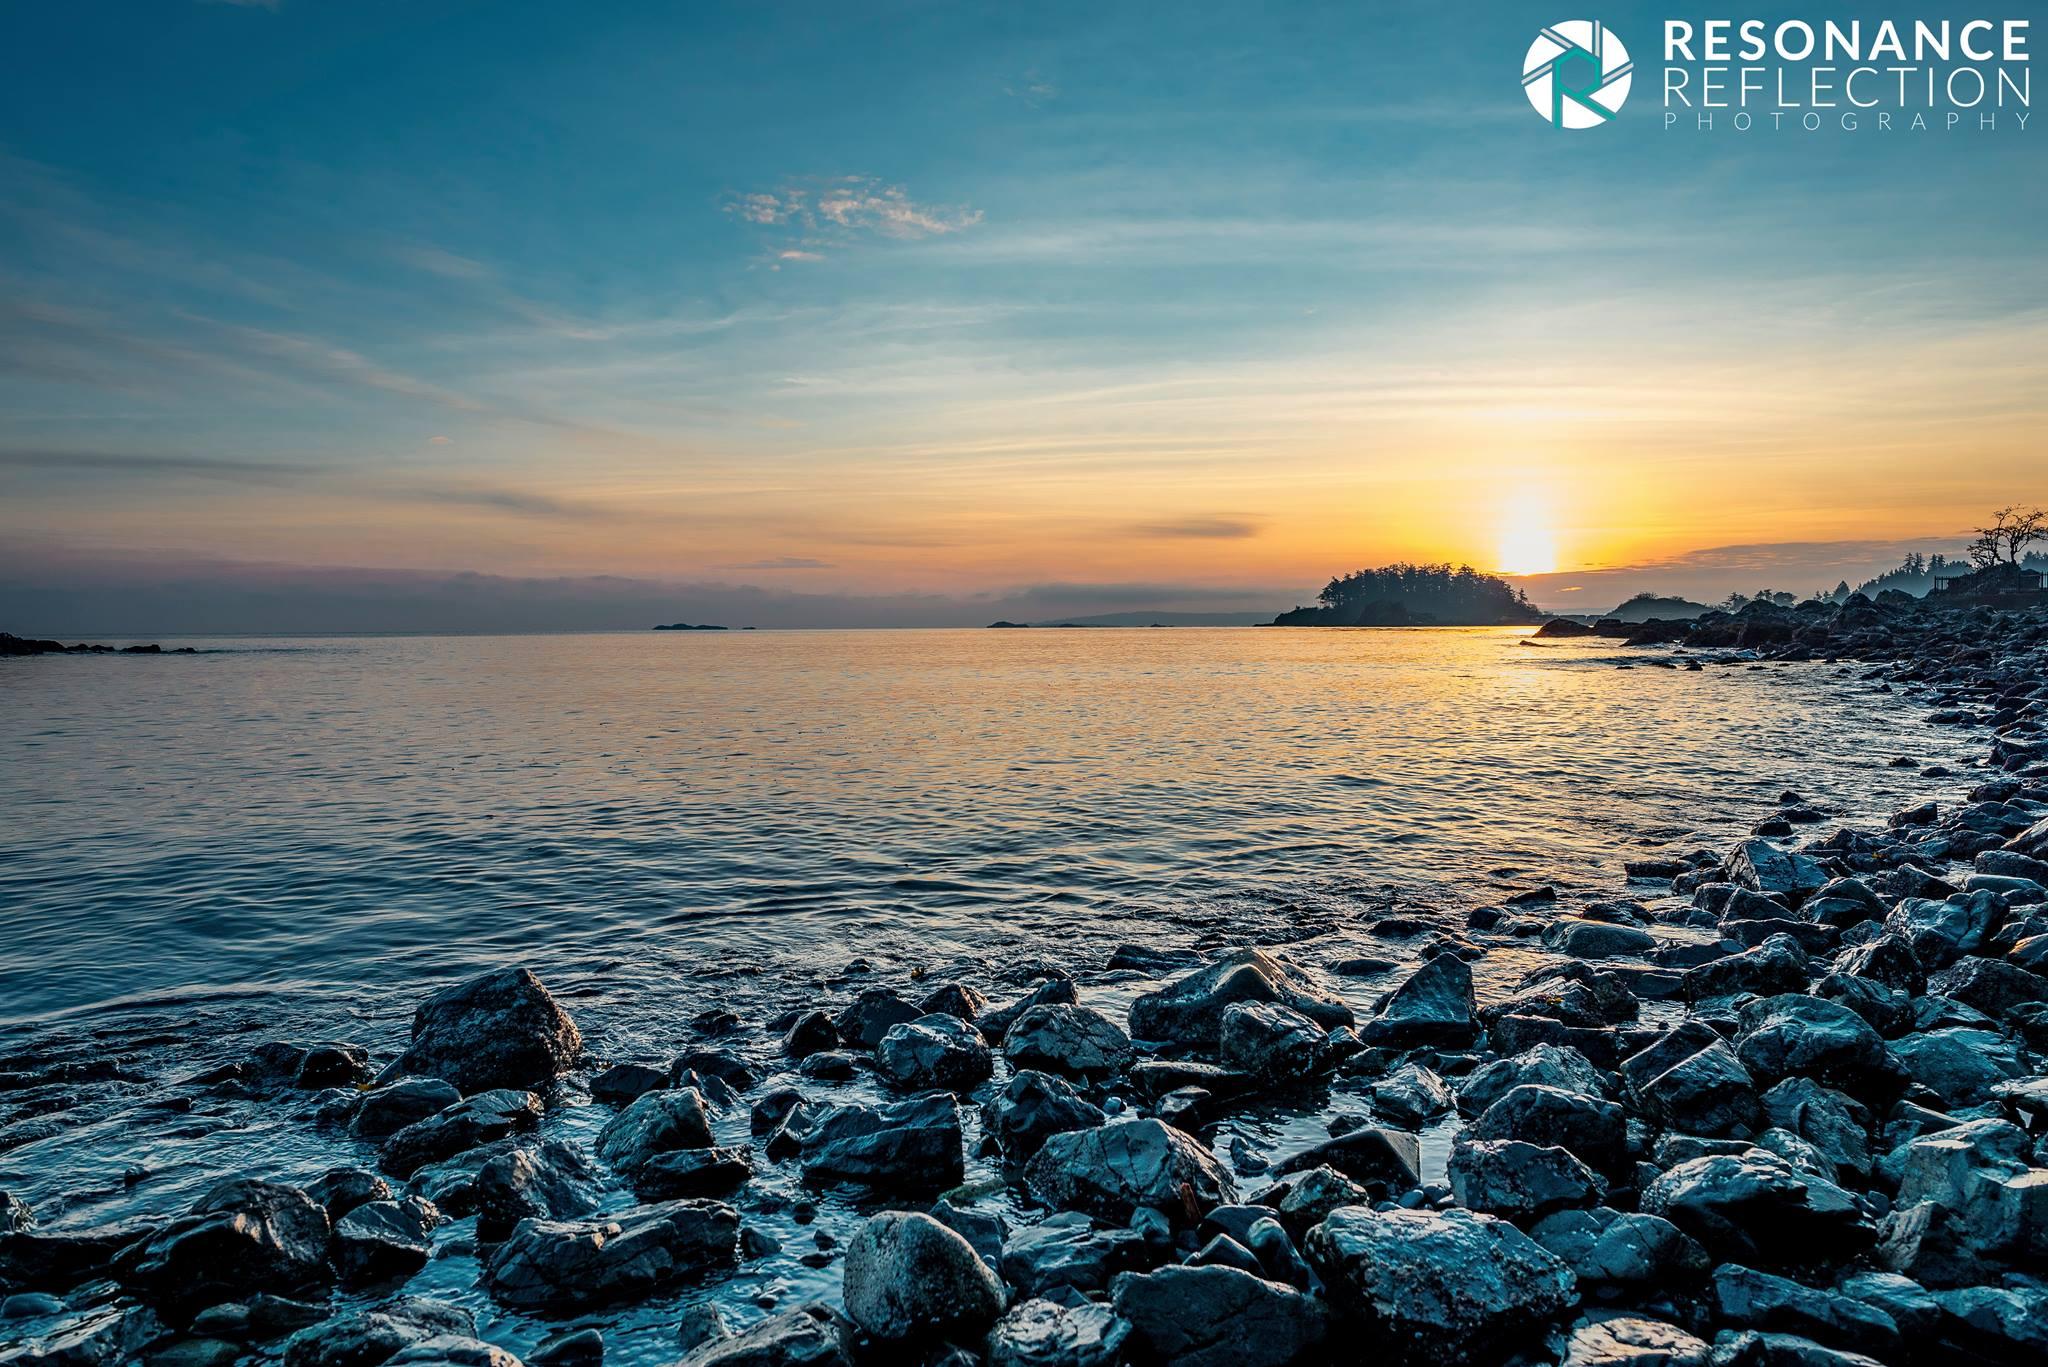 Location: Neck Point Park. Vancouver Island, British Columbia, Canada